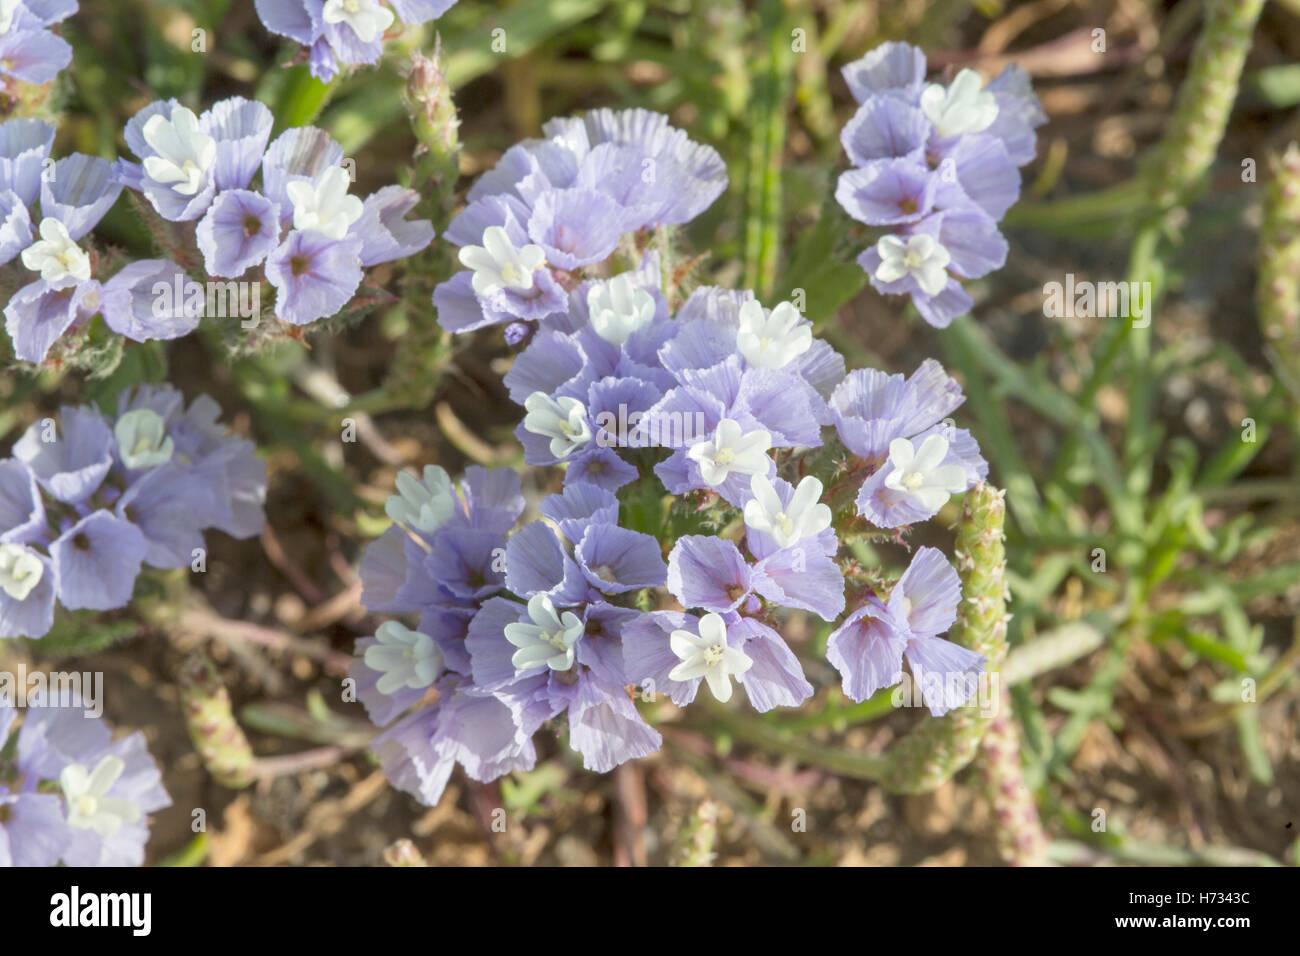 winged sea lavender (Limonium lobatum) flower growing on sandy beach, Crete, Greece - Stock Image